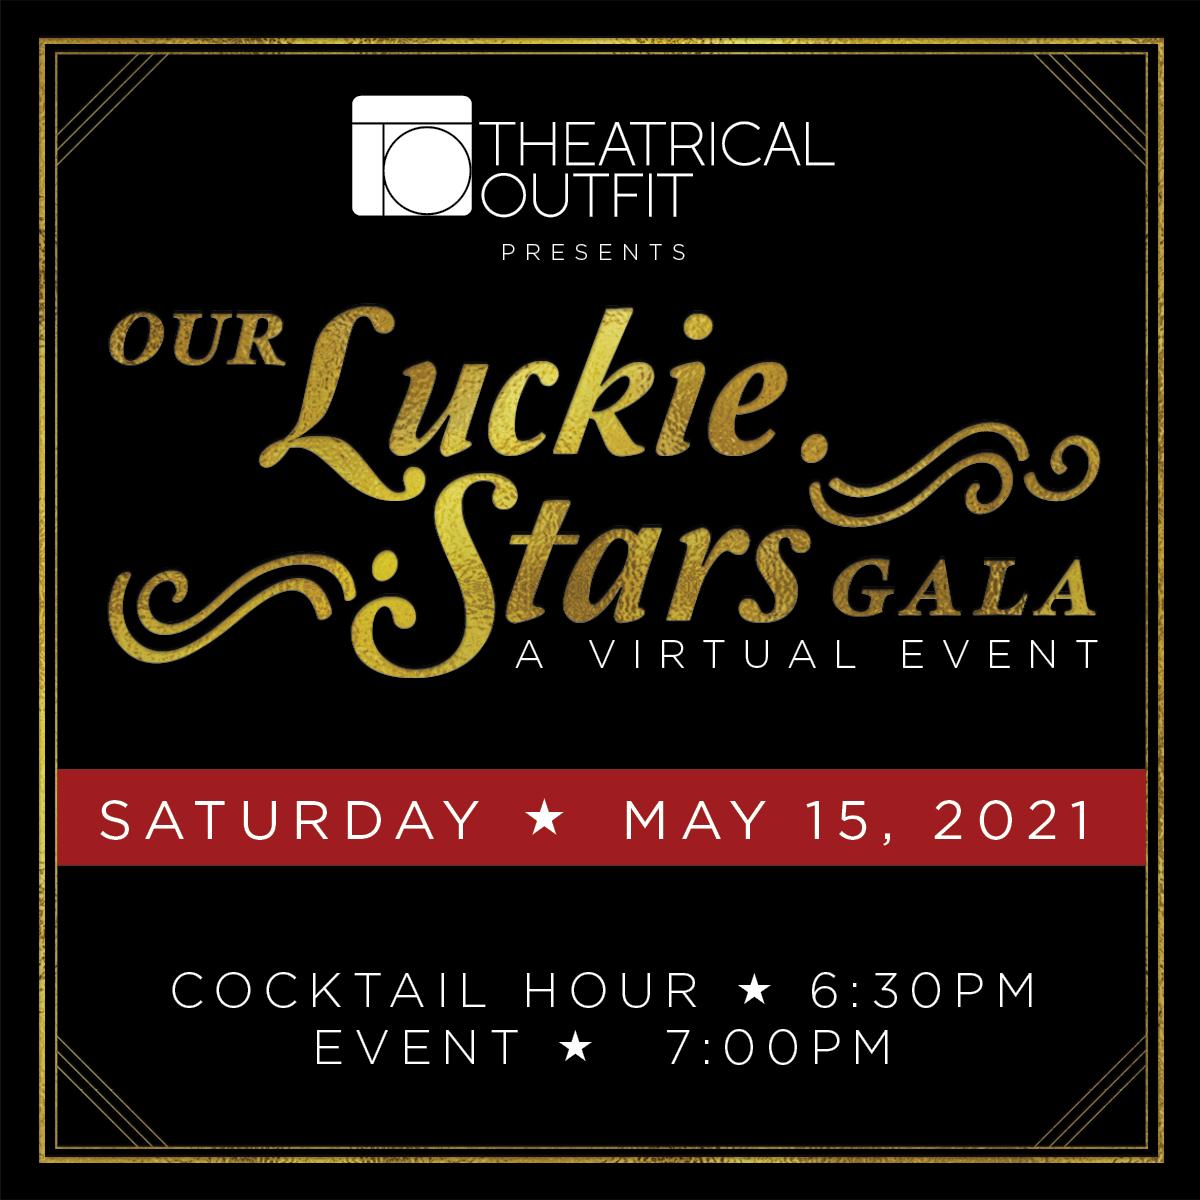 2021_luckiestars_social_1200x1200_event